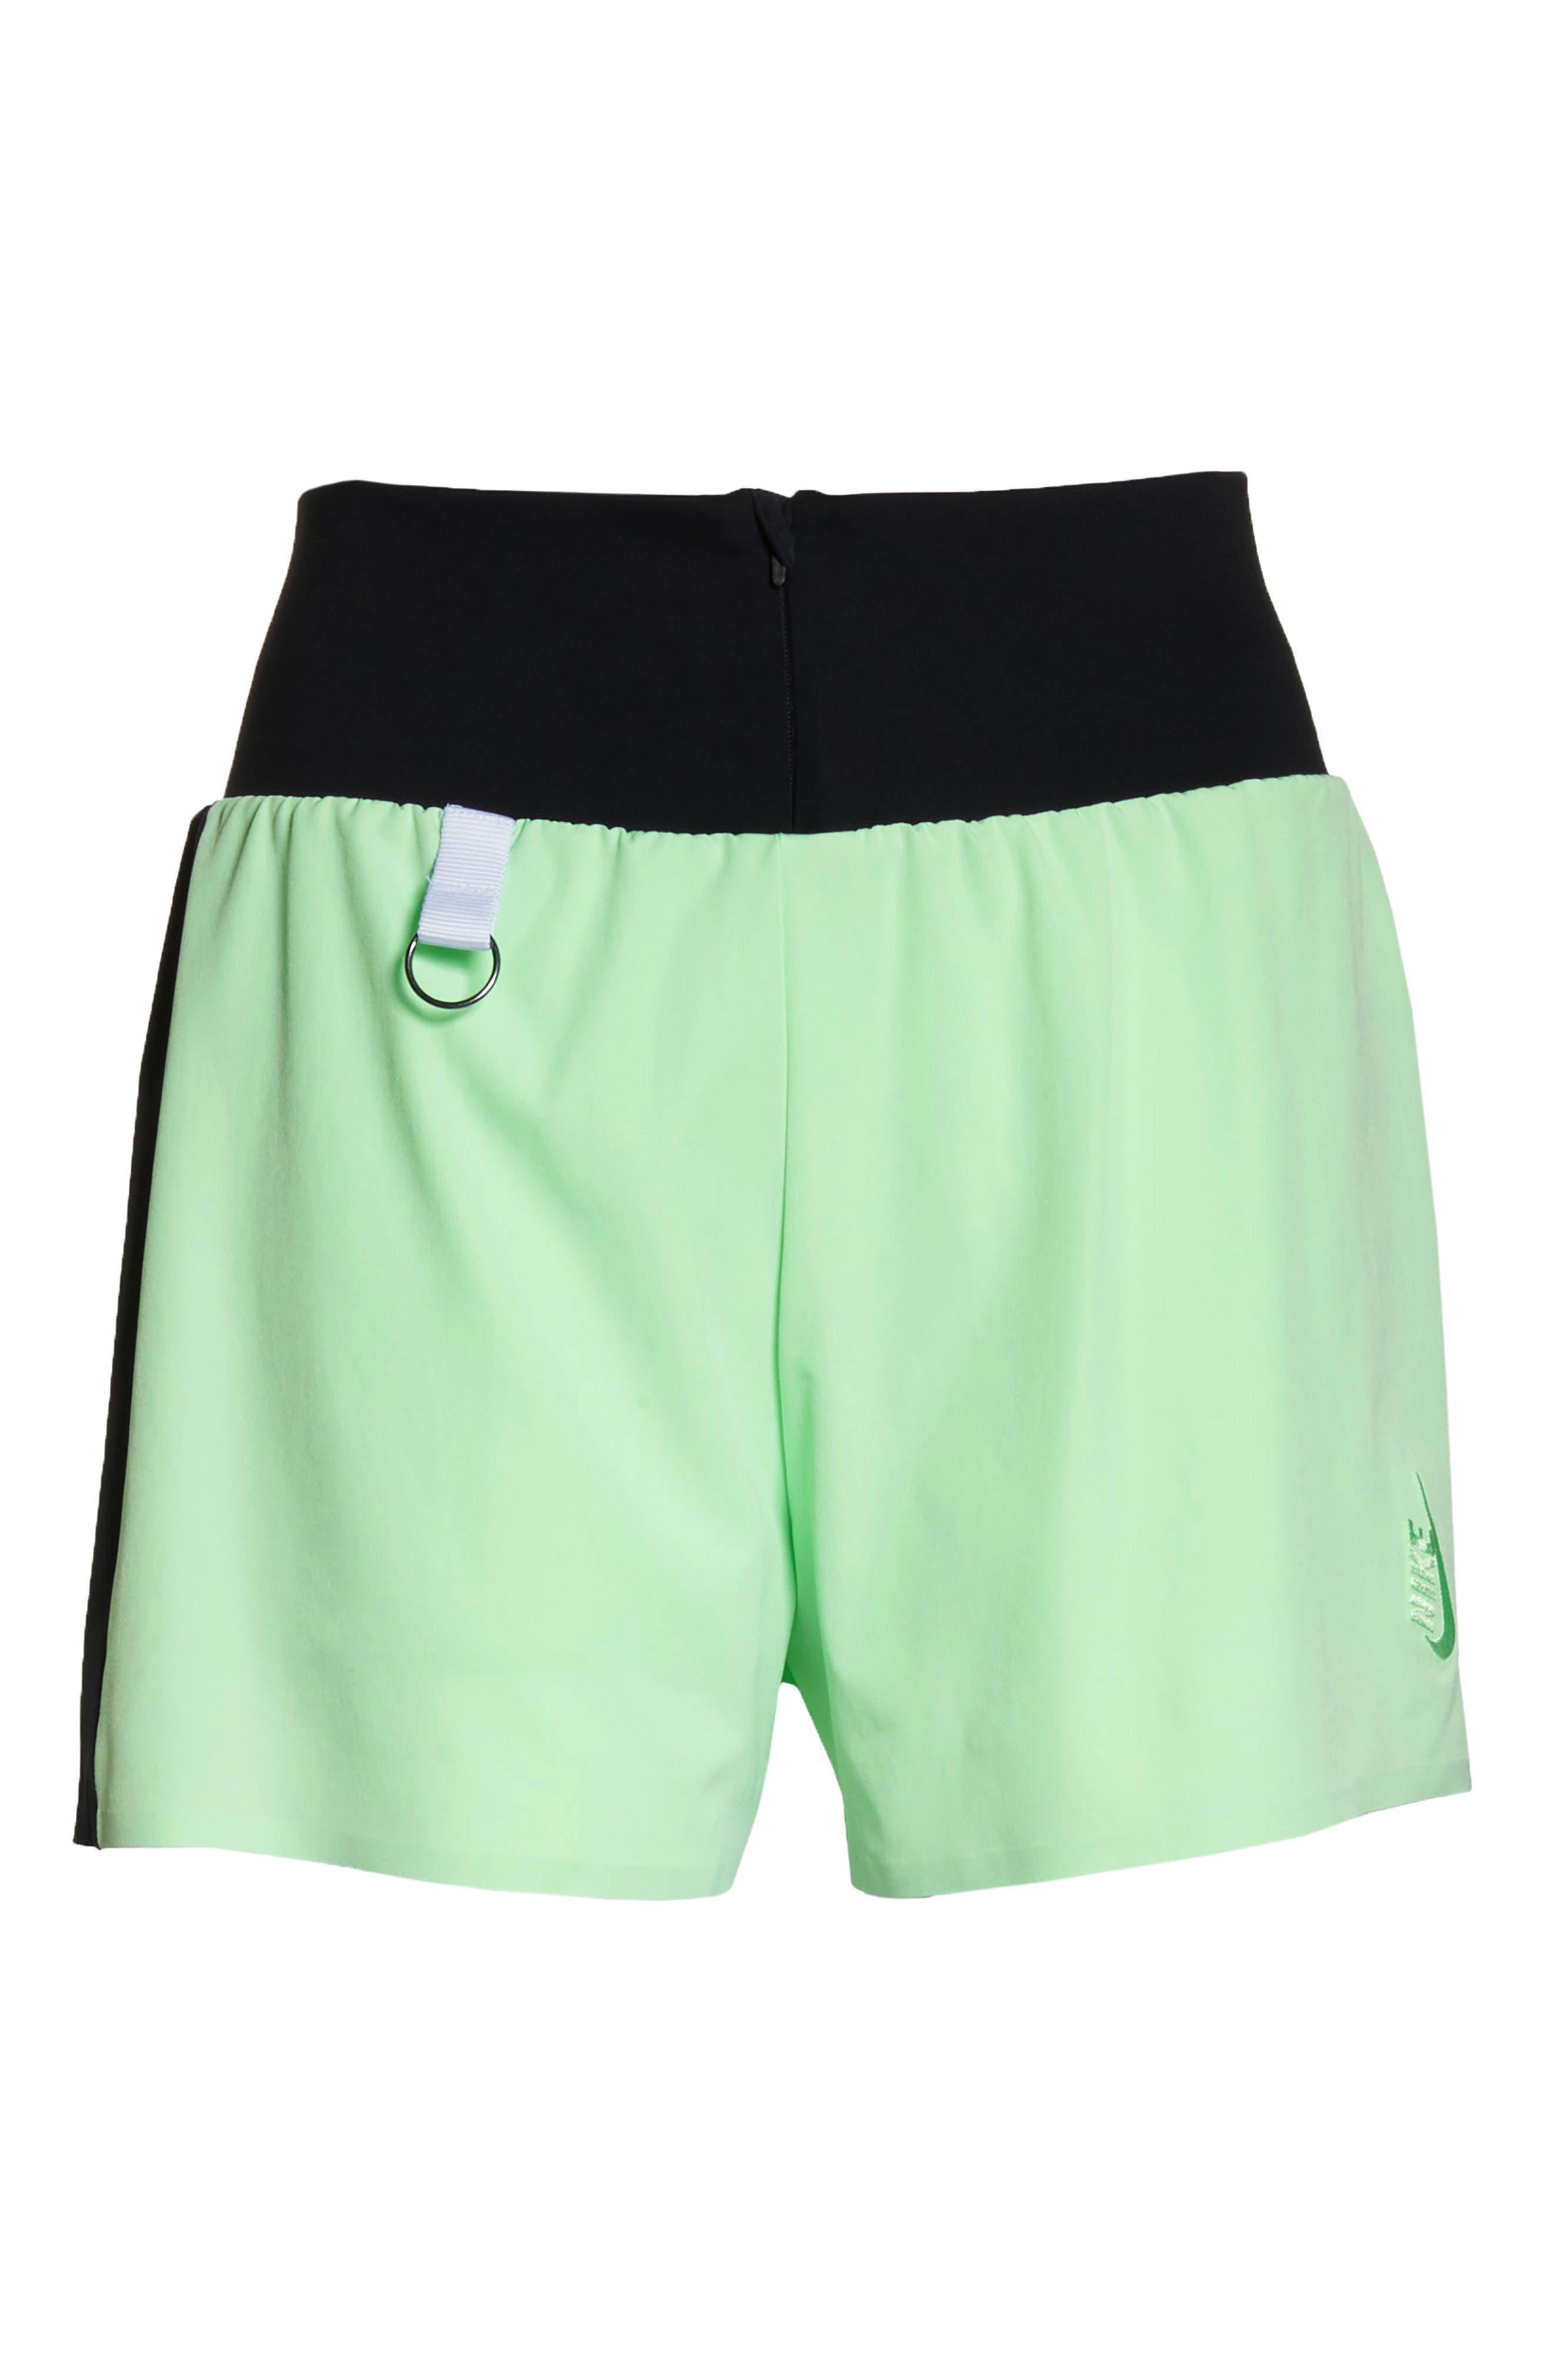 NRG Women's Dri-FIT Running Shorts,                             Alternate thumbnail 7, color,                             VAPOR GREEN/ BLACK/ WHITE